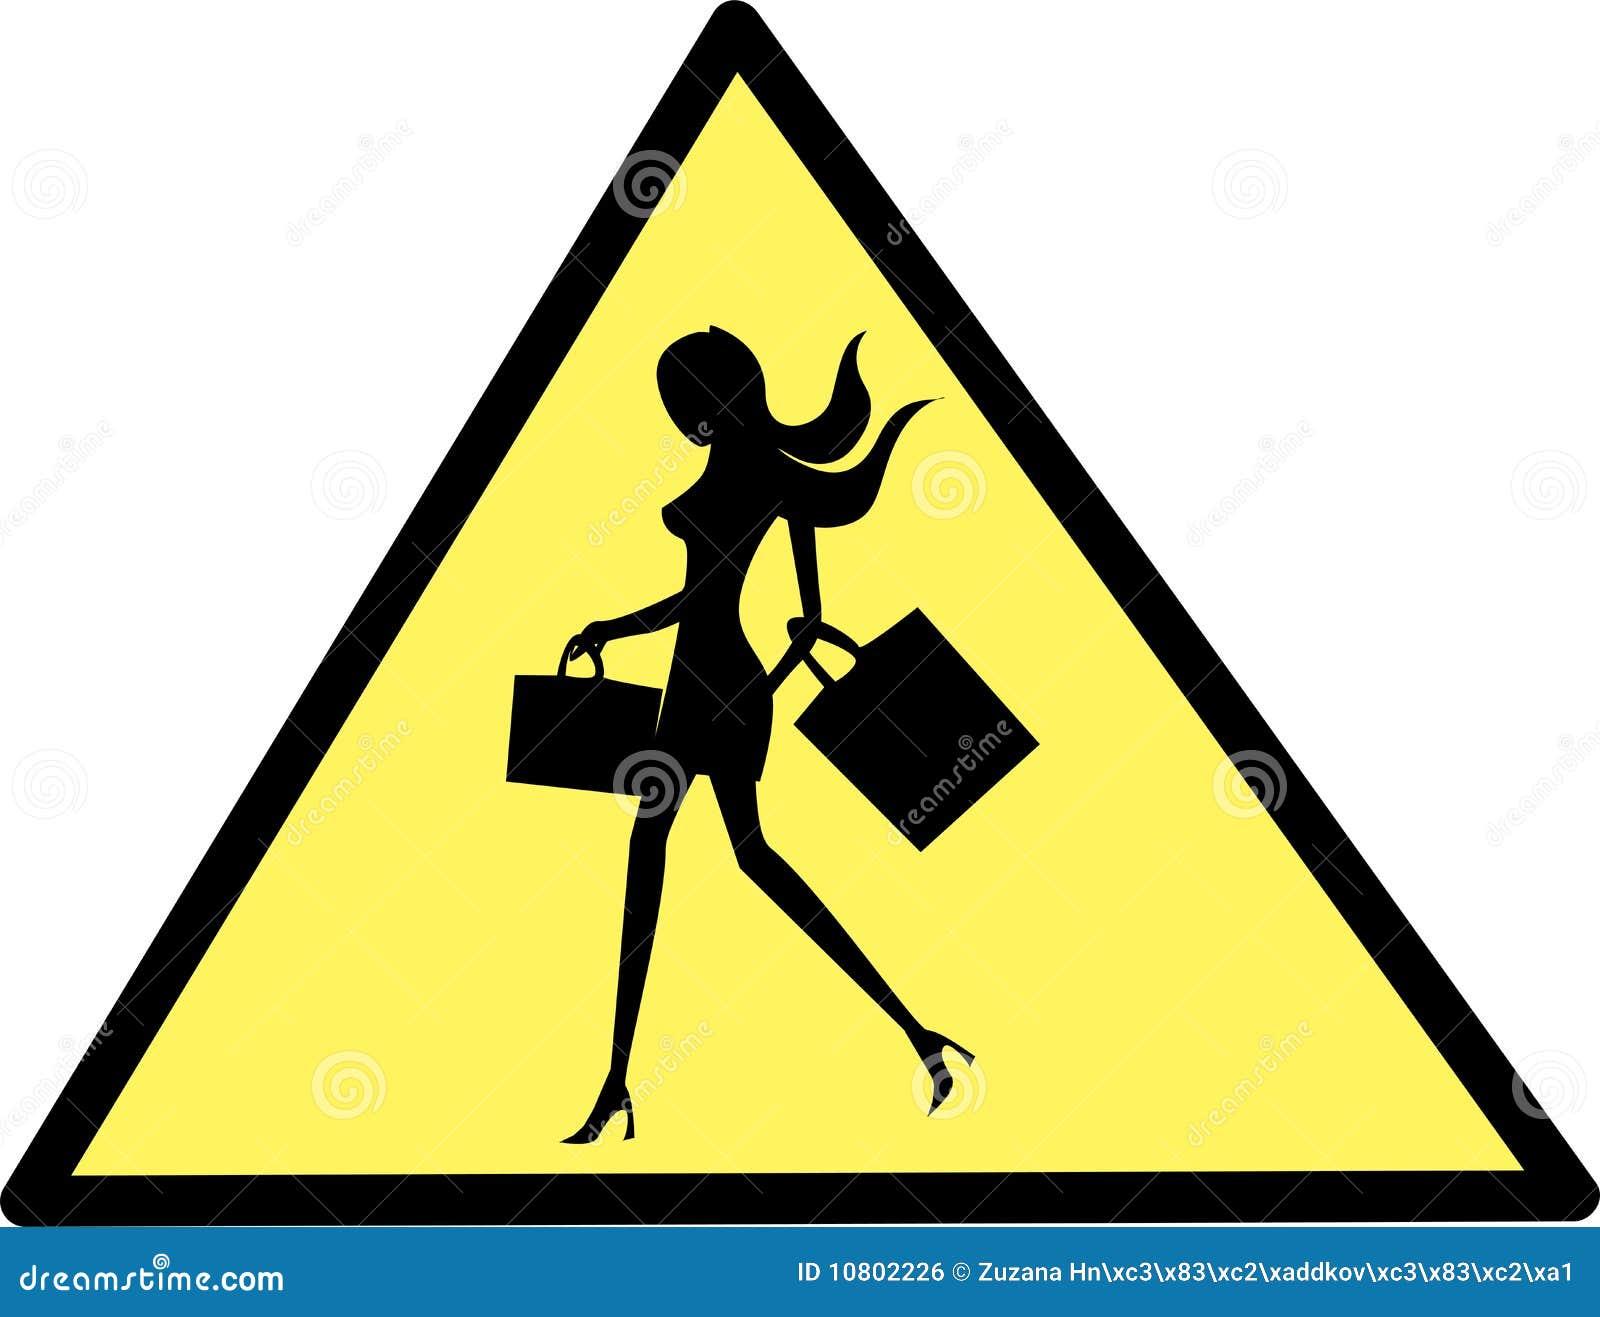 Shopping Sign Royalty Free Stock Image Image 10802226